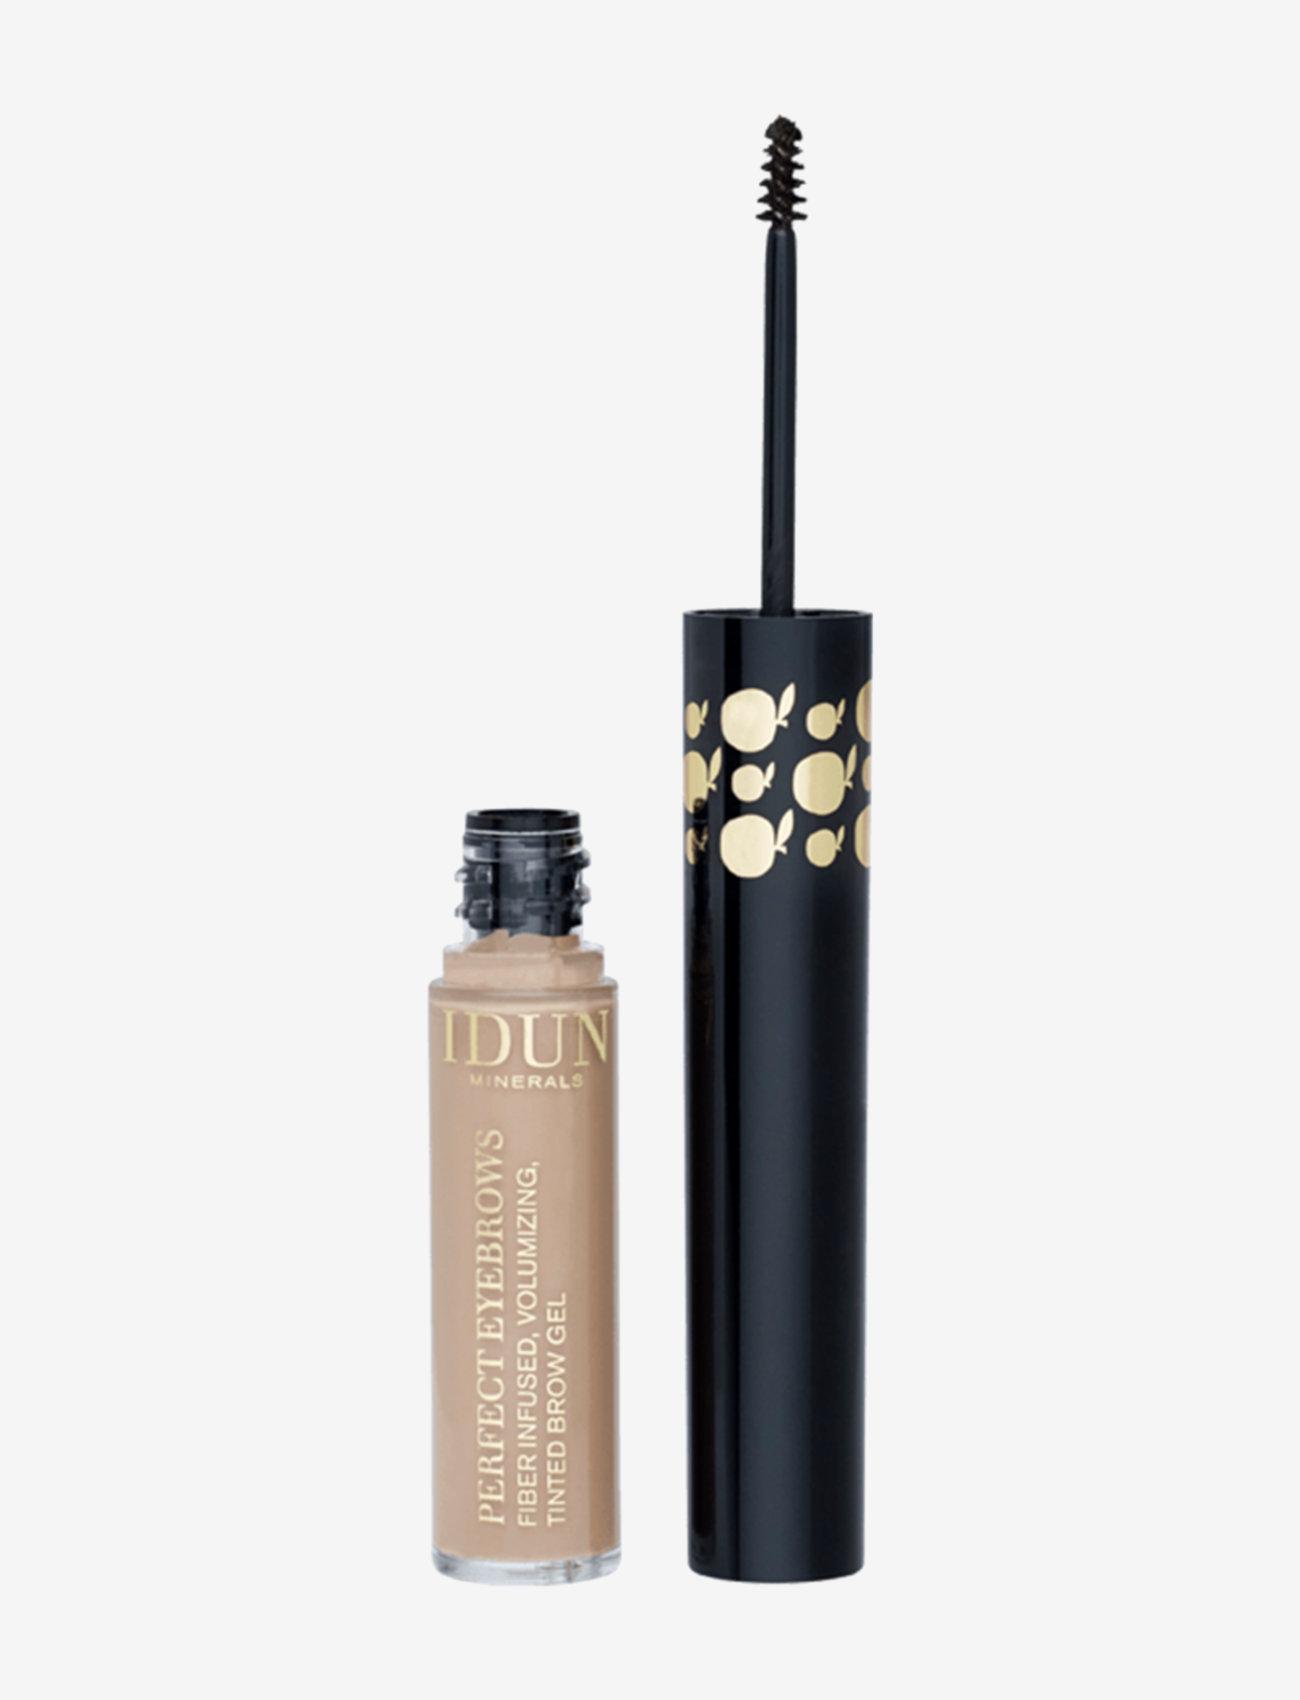 IDUN Minerals - Eye Brow Gel Perfect Eyebrows light - Øjenbrynsgel - light - 0